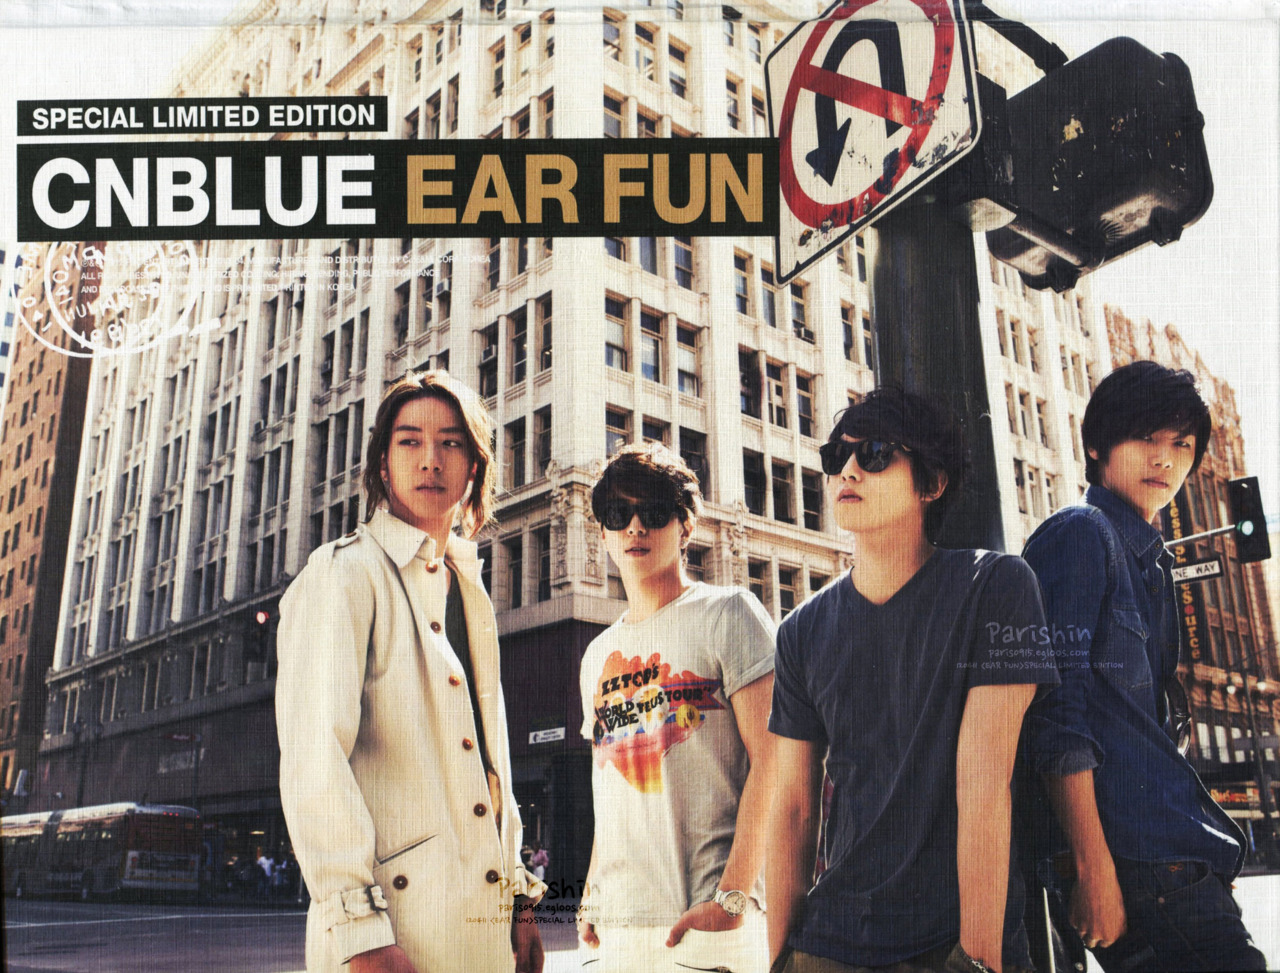 http://4.bp.blogspot.com/-BRgsXRJugiE/T6QKFcMFumI/AAAAAAAAJpU/hzzvz4k8SgE/s1600/%5BSCAN%5D+CNBLUE+Ear+Fun+Limited+Edition+Part+1+(1).jpg